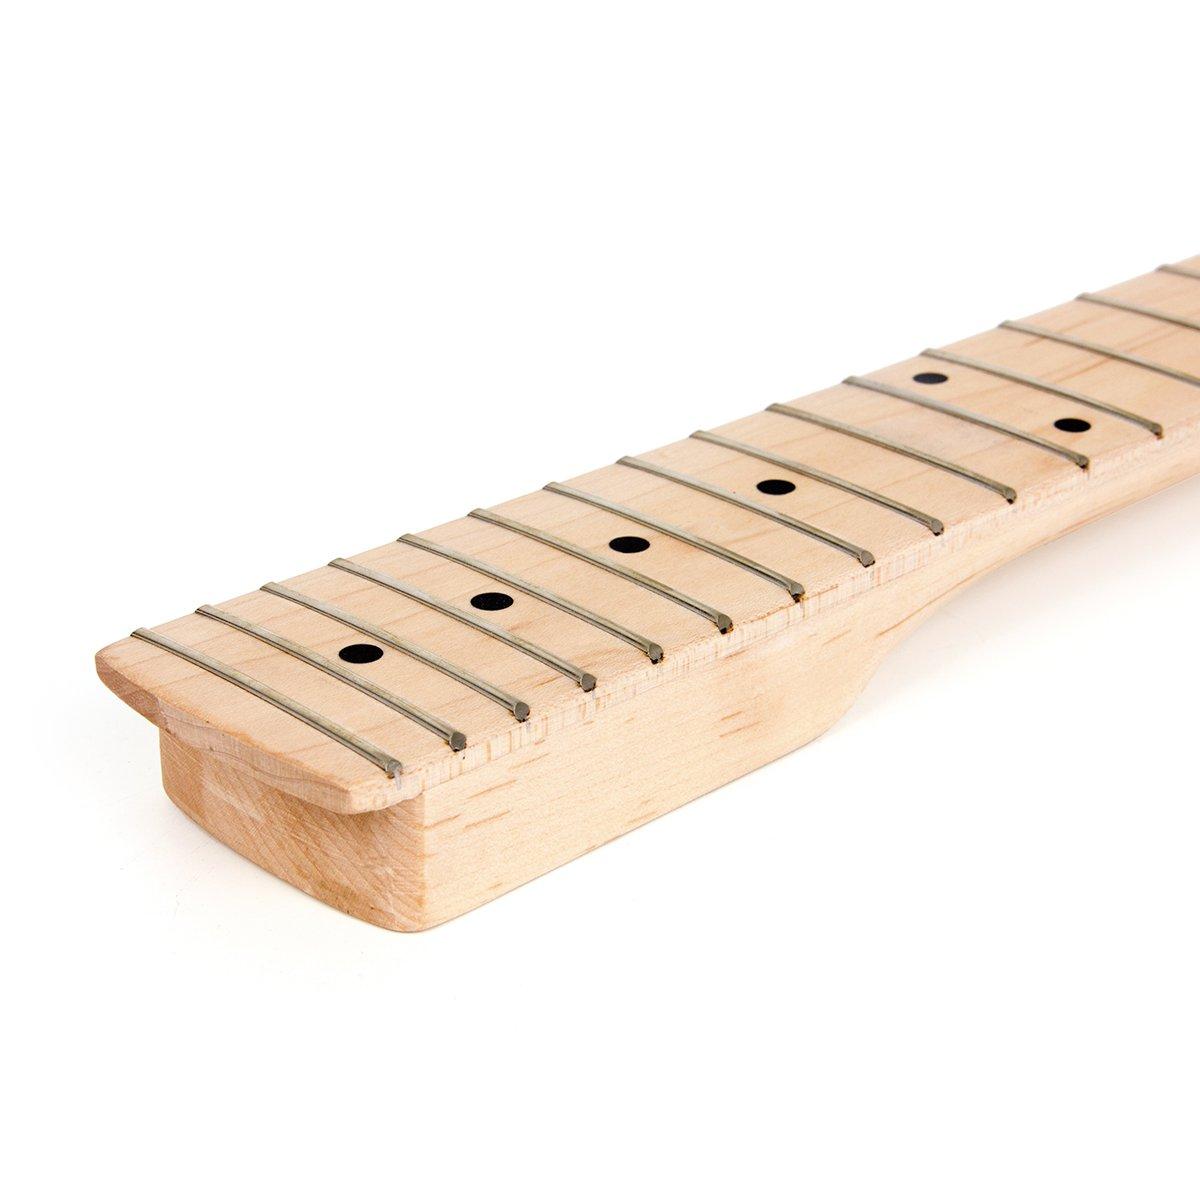 Kmise DIY Parts Clear Satin Maple 22 Fret Bolt on Paddle Headstock Electric Guitar Neck (4334250134) by Kmise (Image #6)